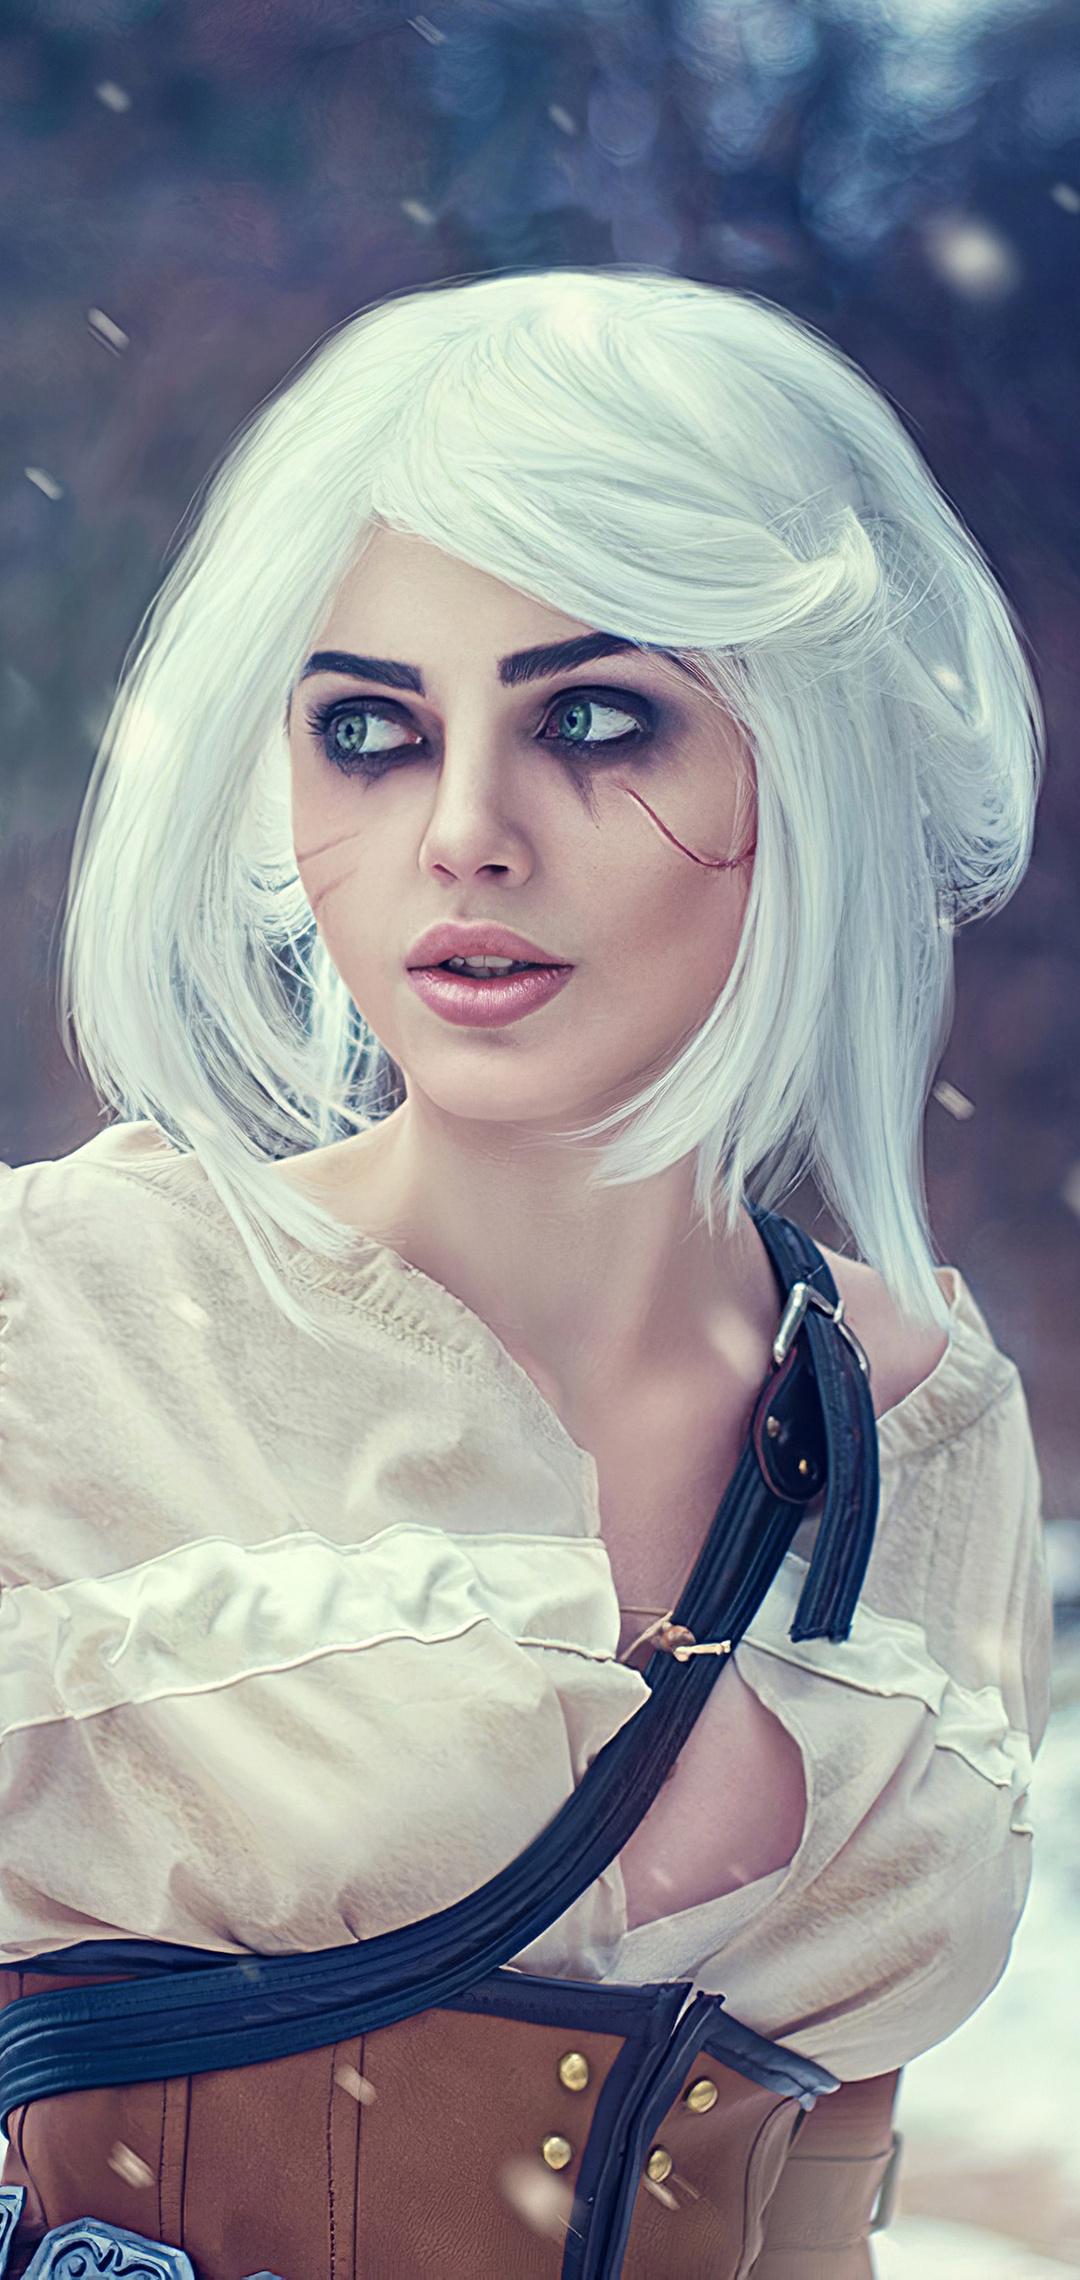 ciri-the-witcher-3-wild-hunt-cosplay-4k-t2.jpg